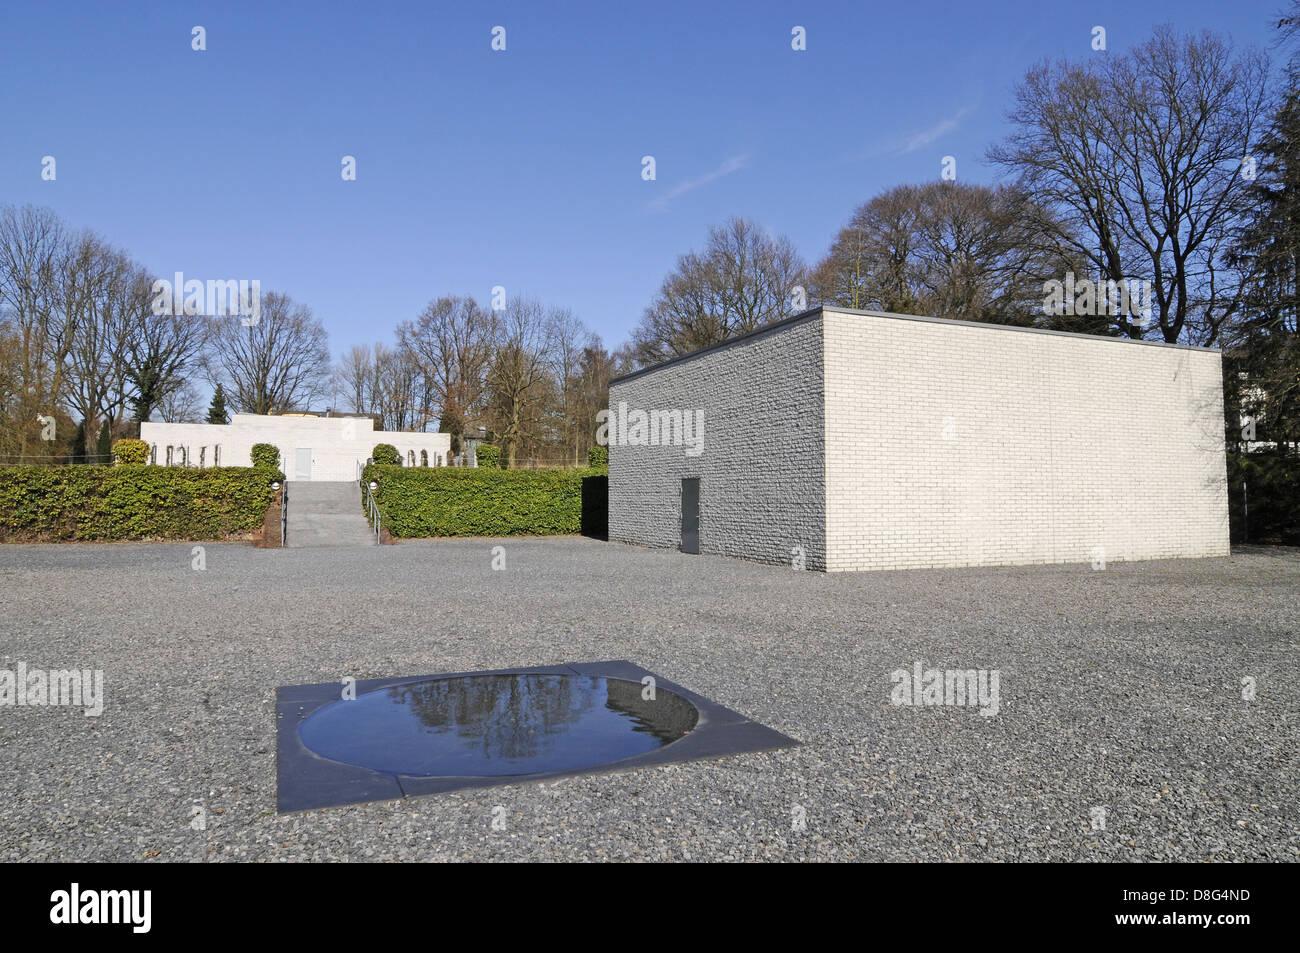 Situation art Stock Photo